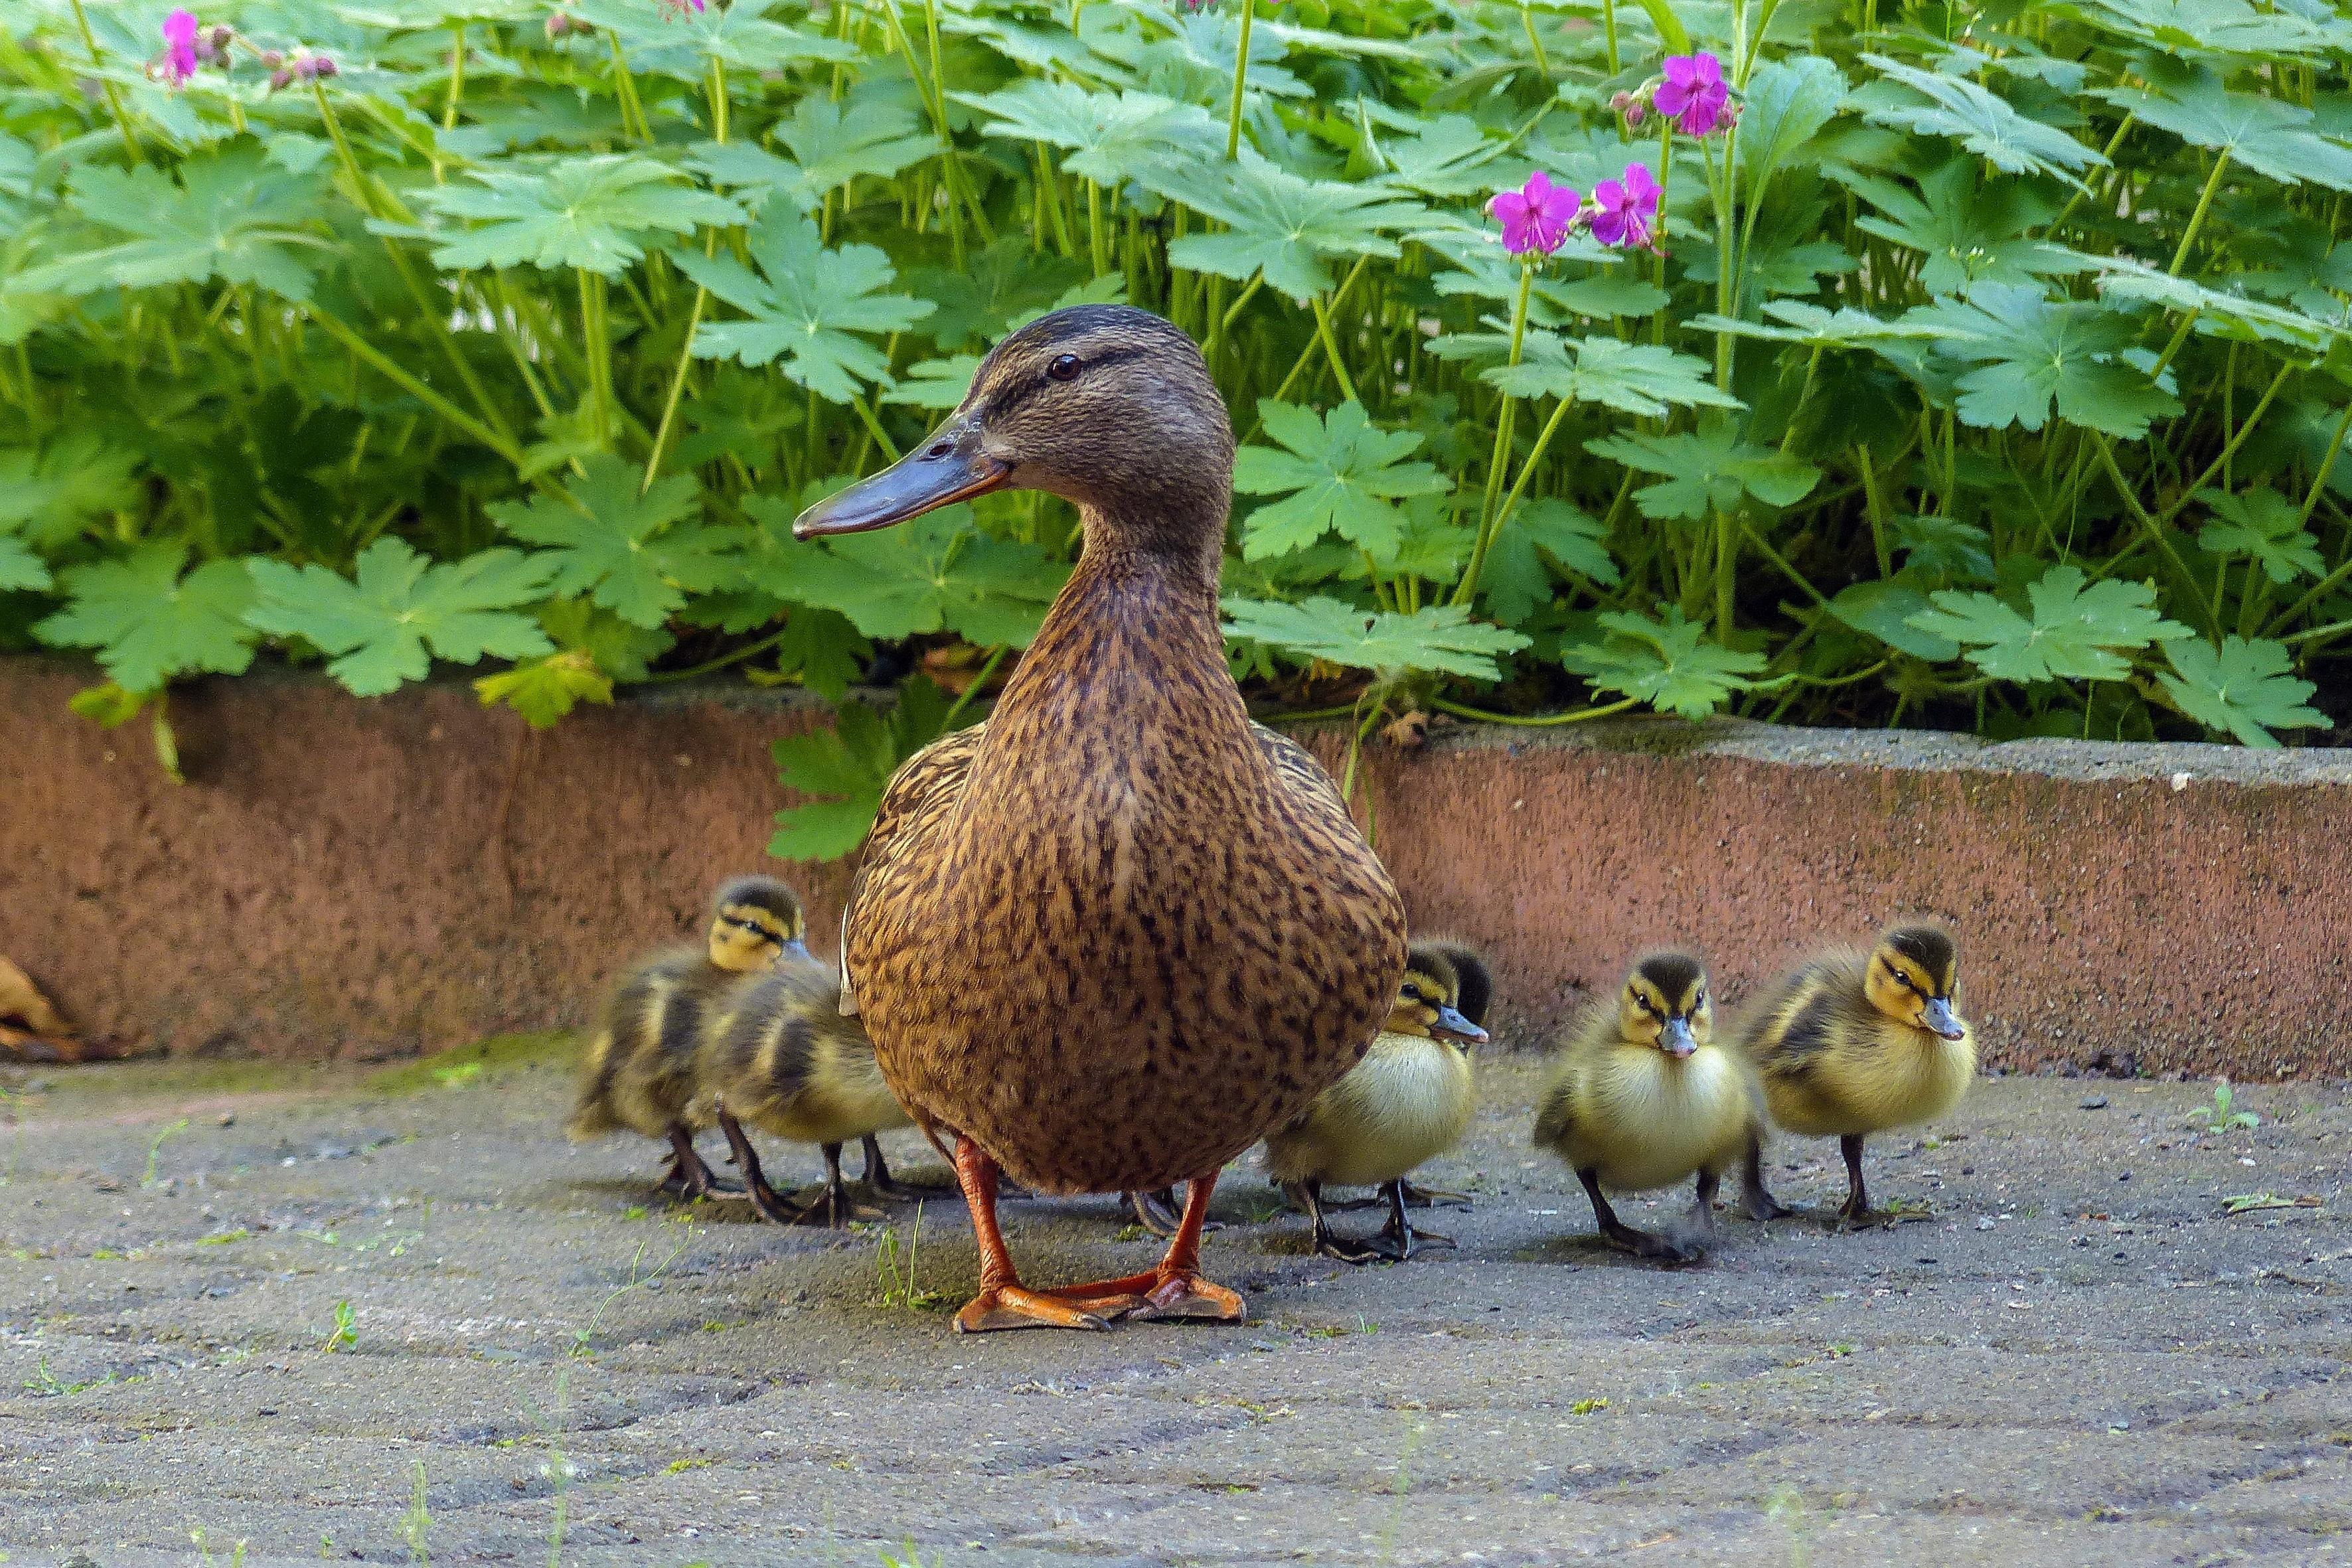 Free Images : nature, animal, wildlife, beak, fowl, fauna ...